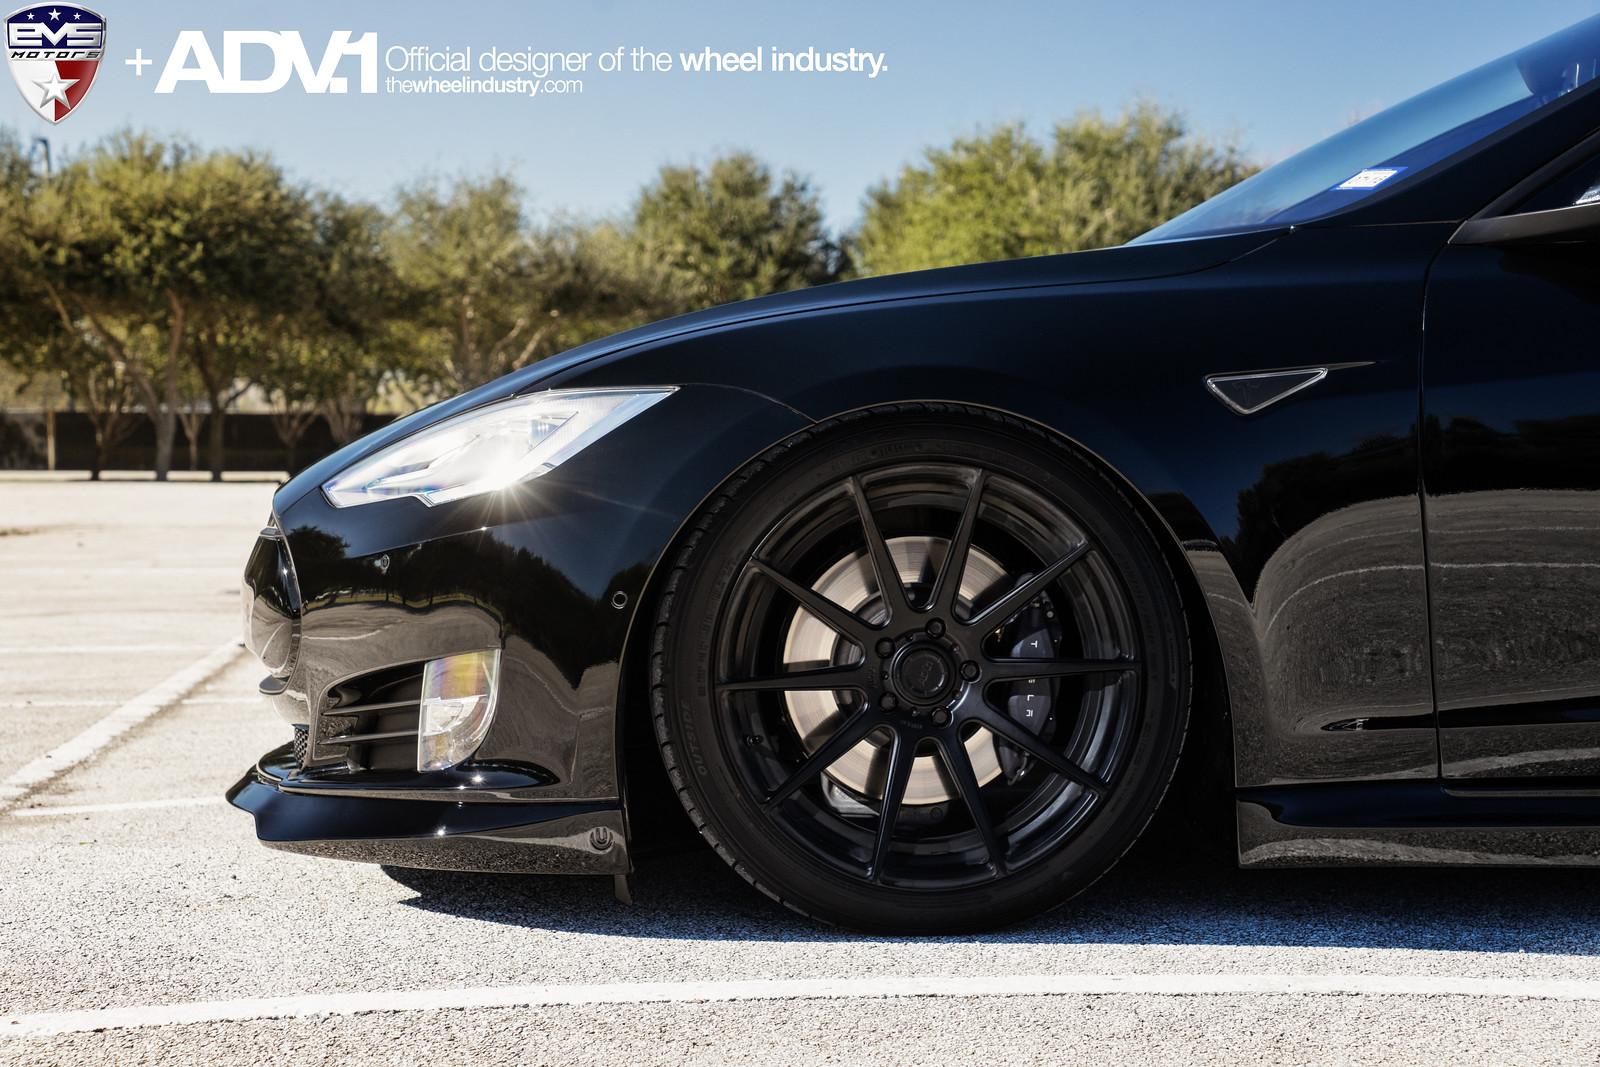 ADV1_EVS_Motors_Tesla_Model_S-3-X3.jpg